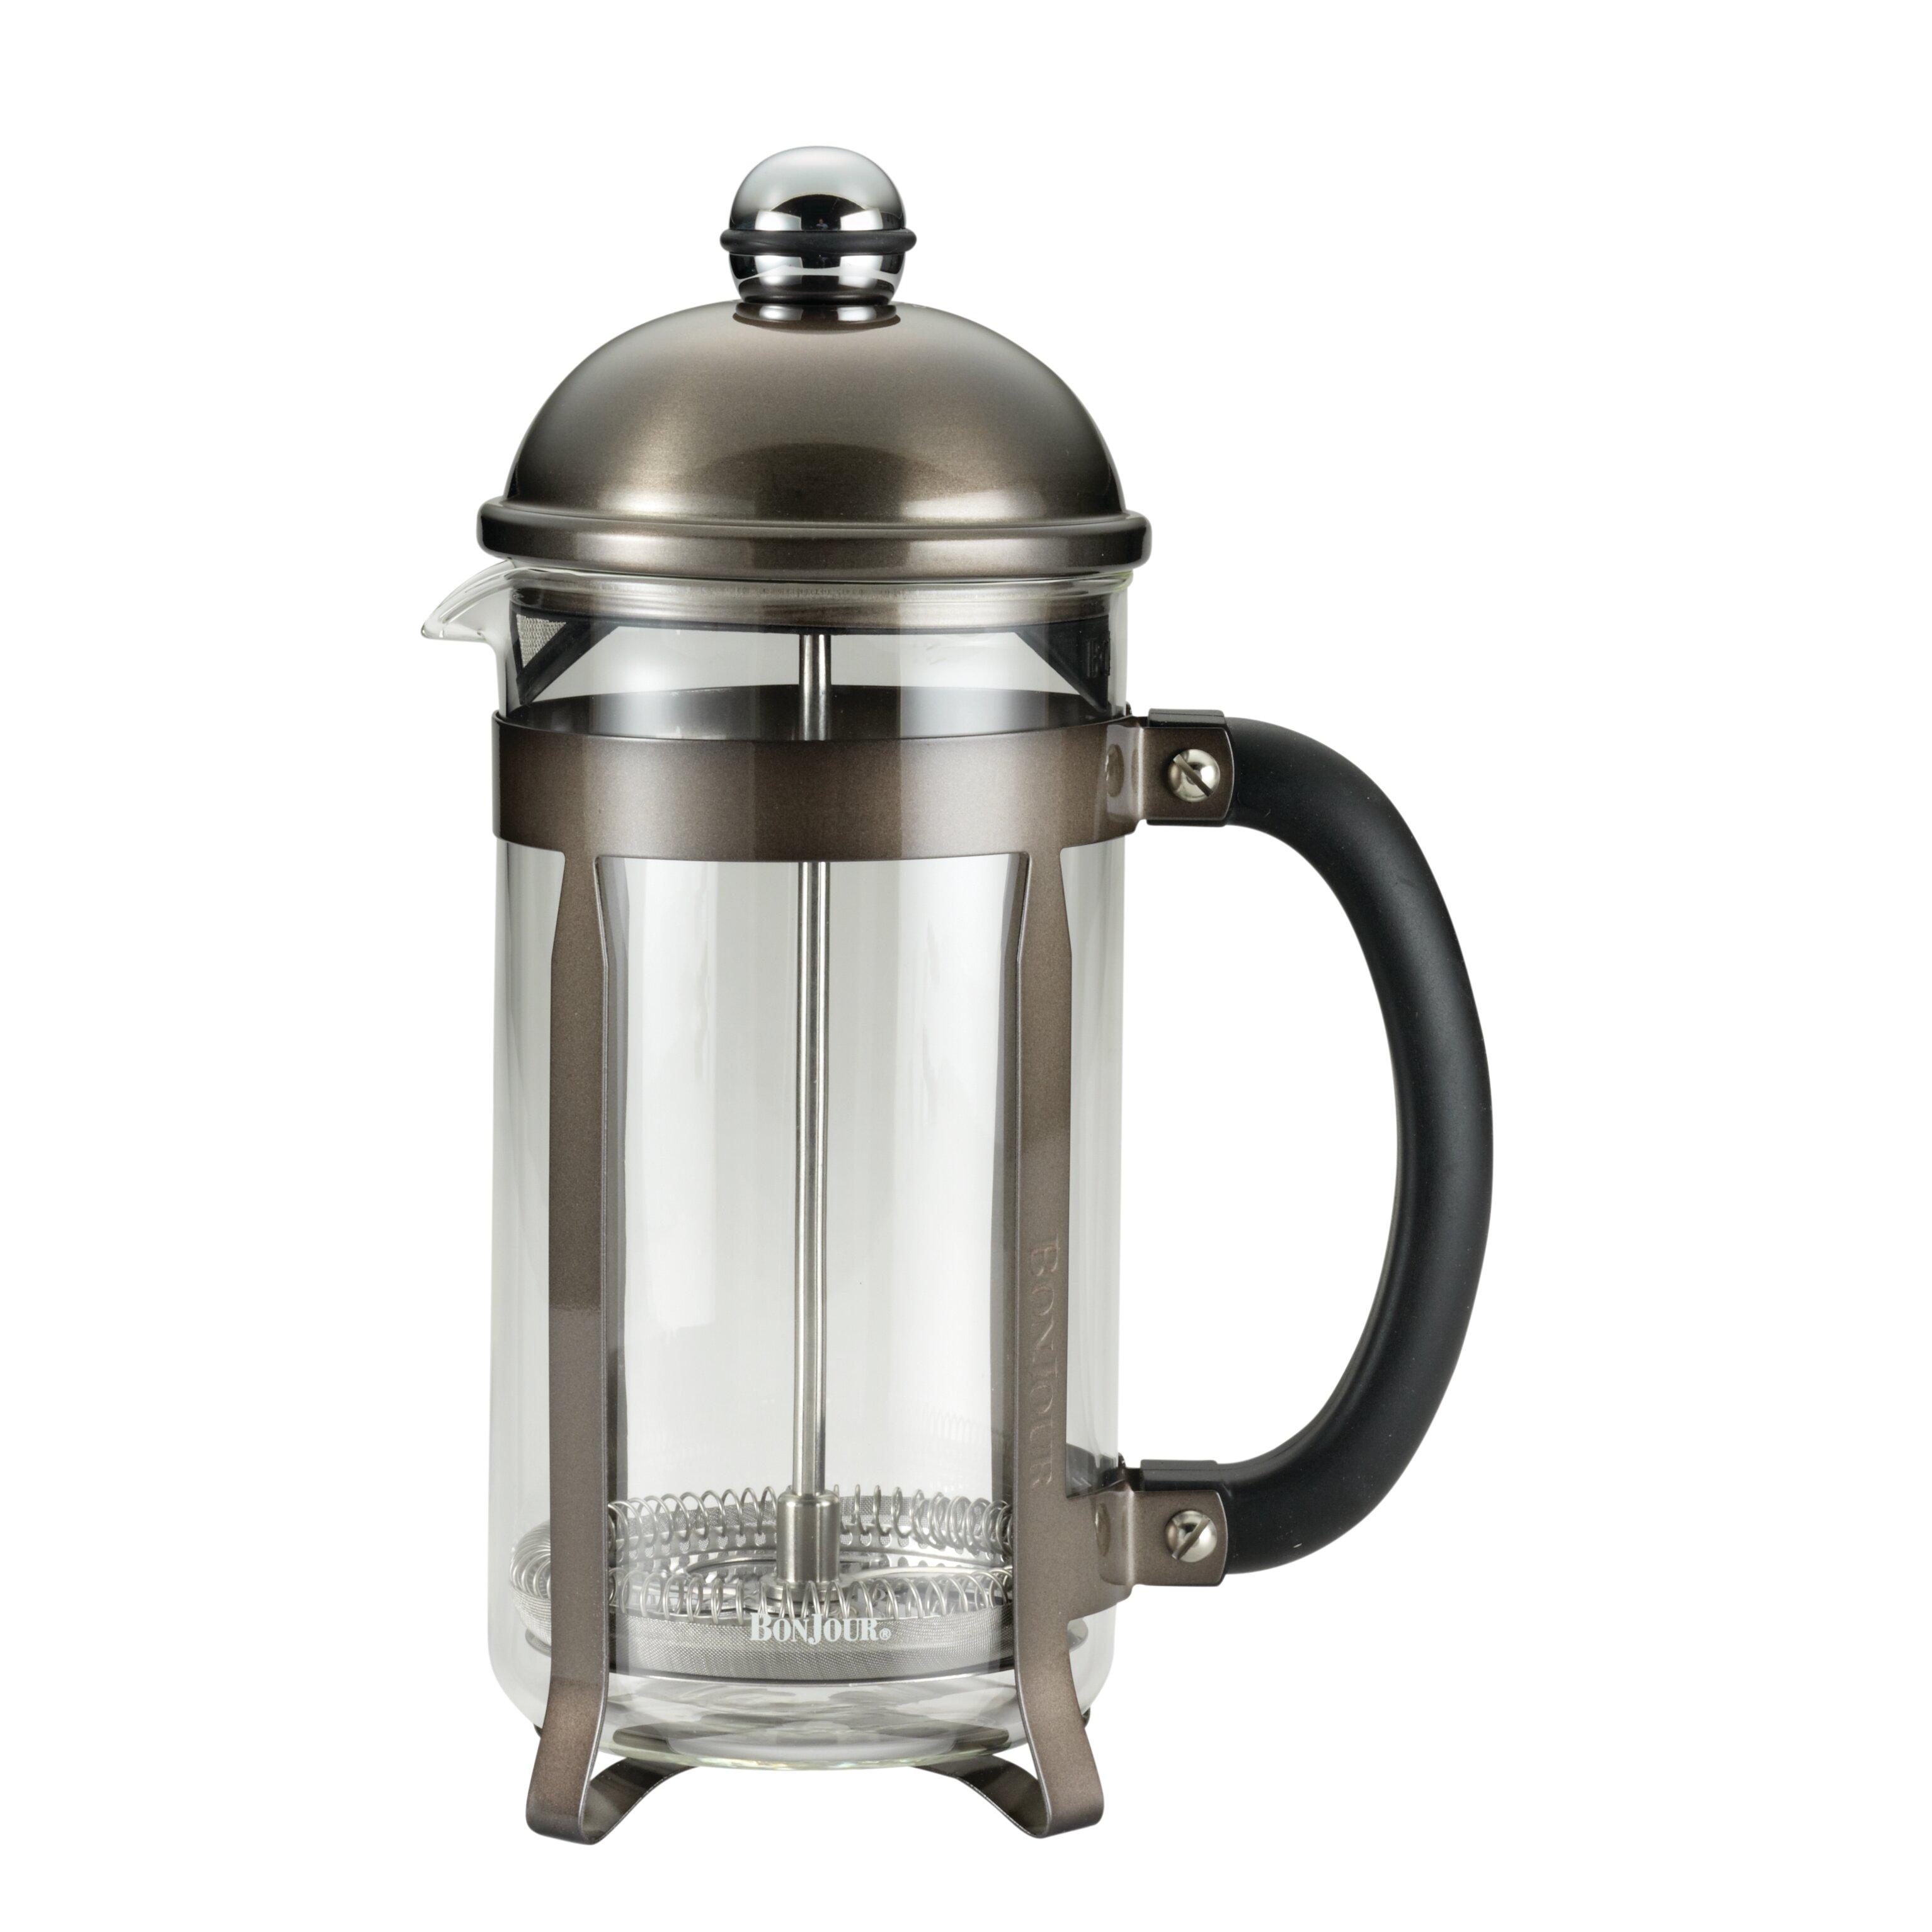 French Press Coffee Maker Flipkart : Anolon BonJour Coffee 8-Cup Maximus French Press Coffee Maker Wayfair